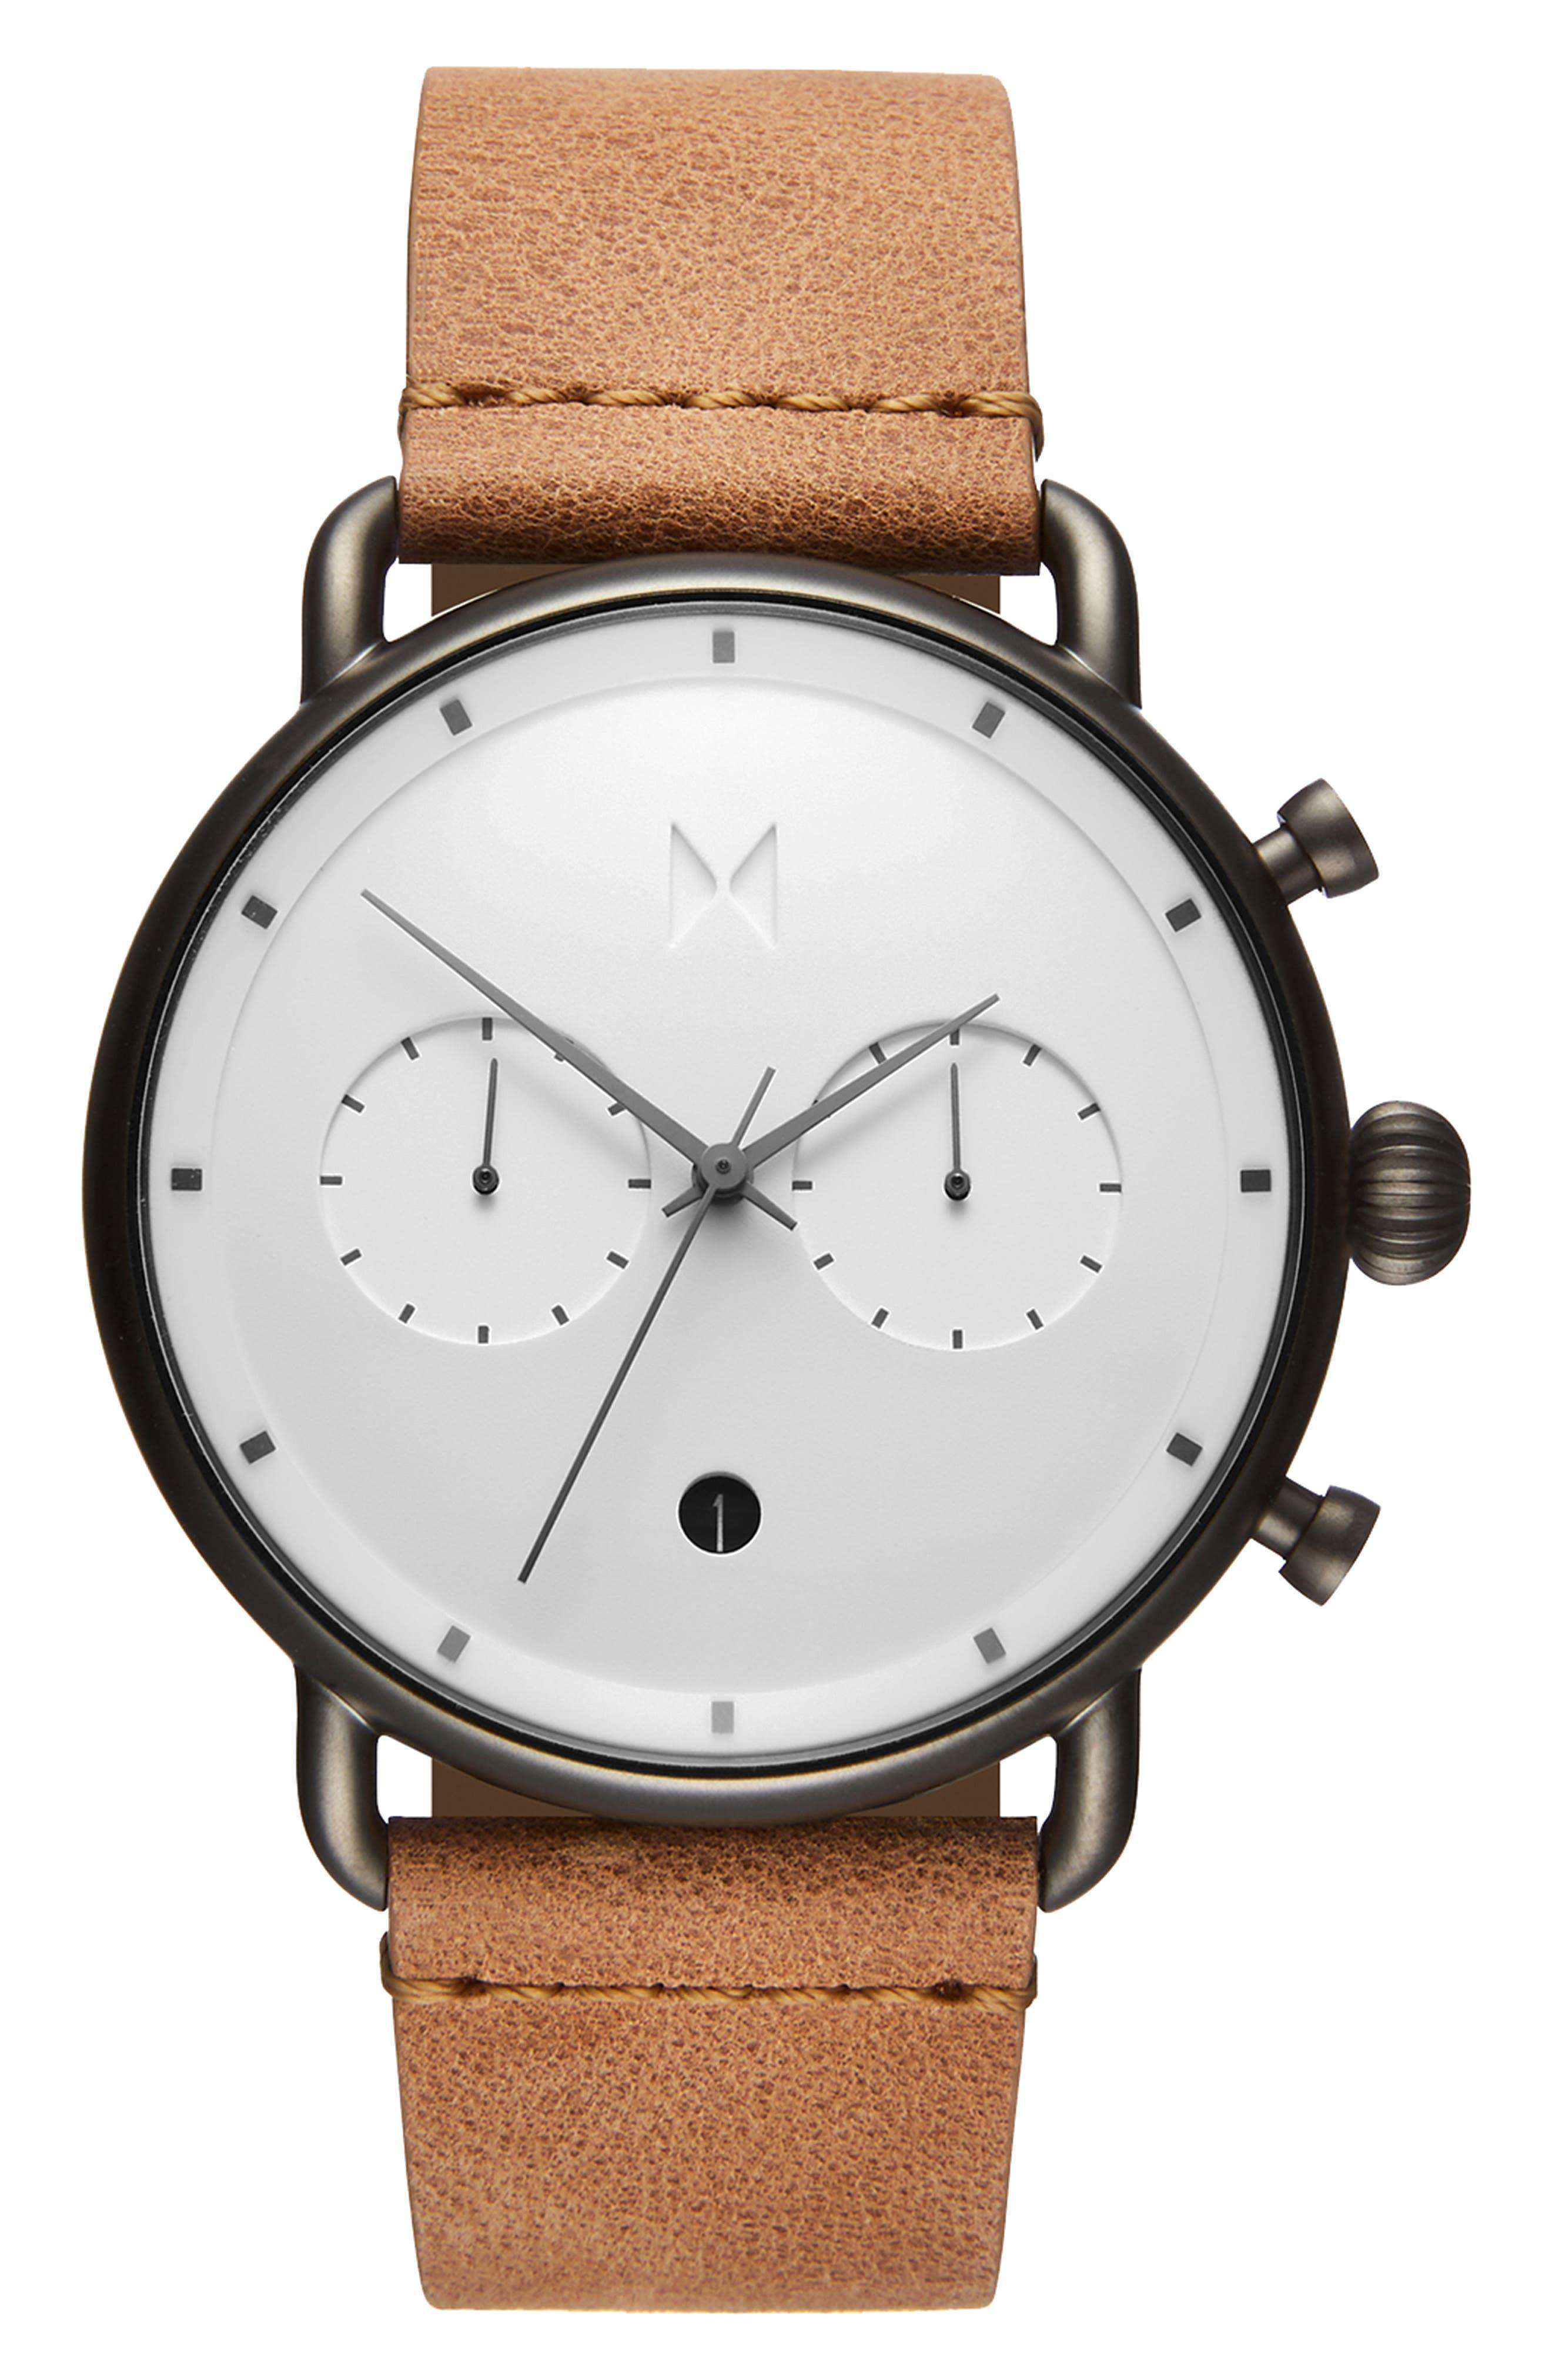 Blacktop Chronograph Leather Strap Watch,                             Alternate thumbnail 4, color,                             WHITE/ CARAMEL